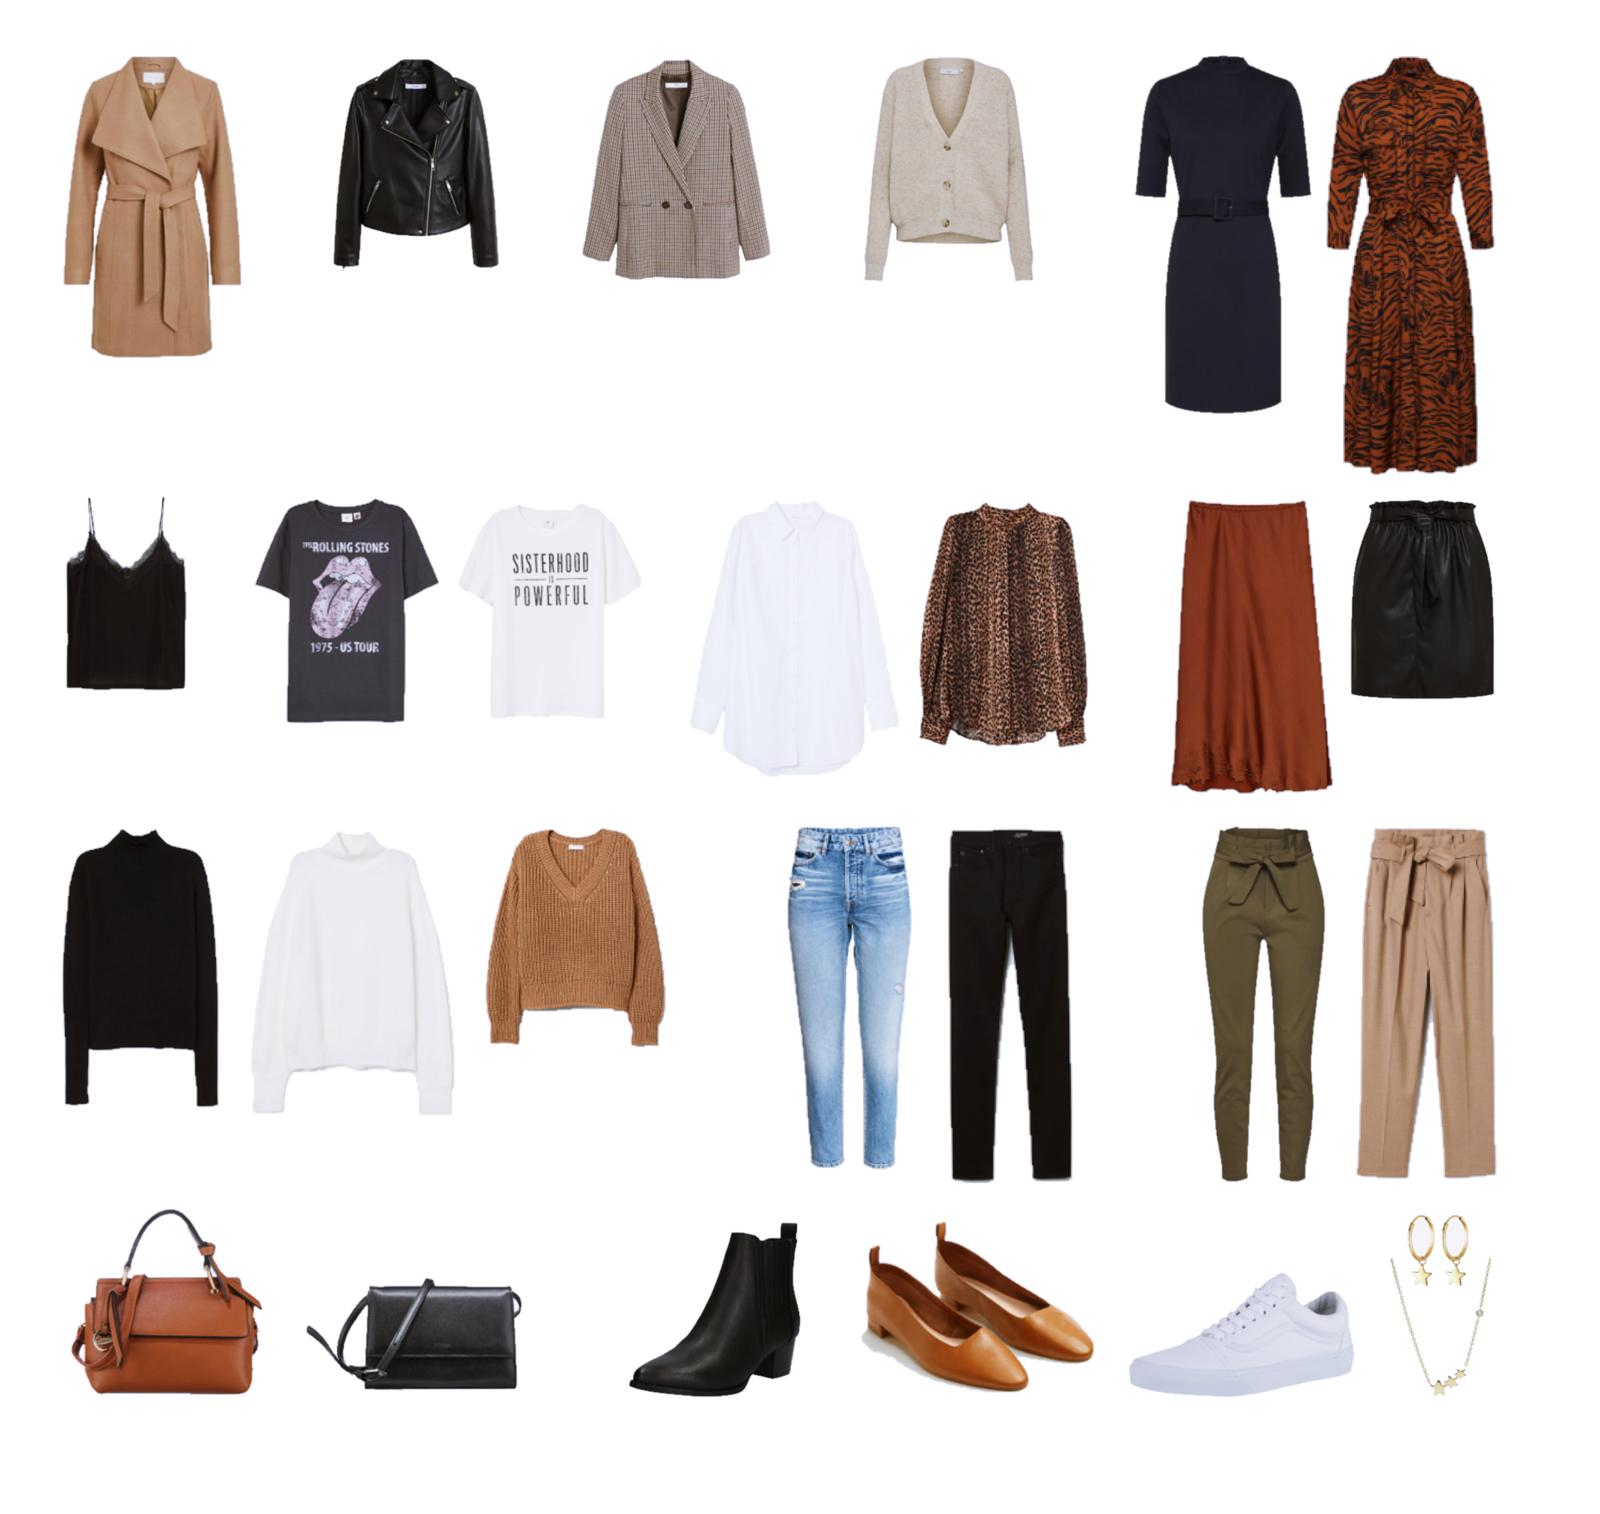 Autumn Capsule Wardrobe 2019